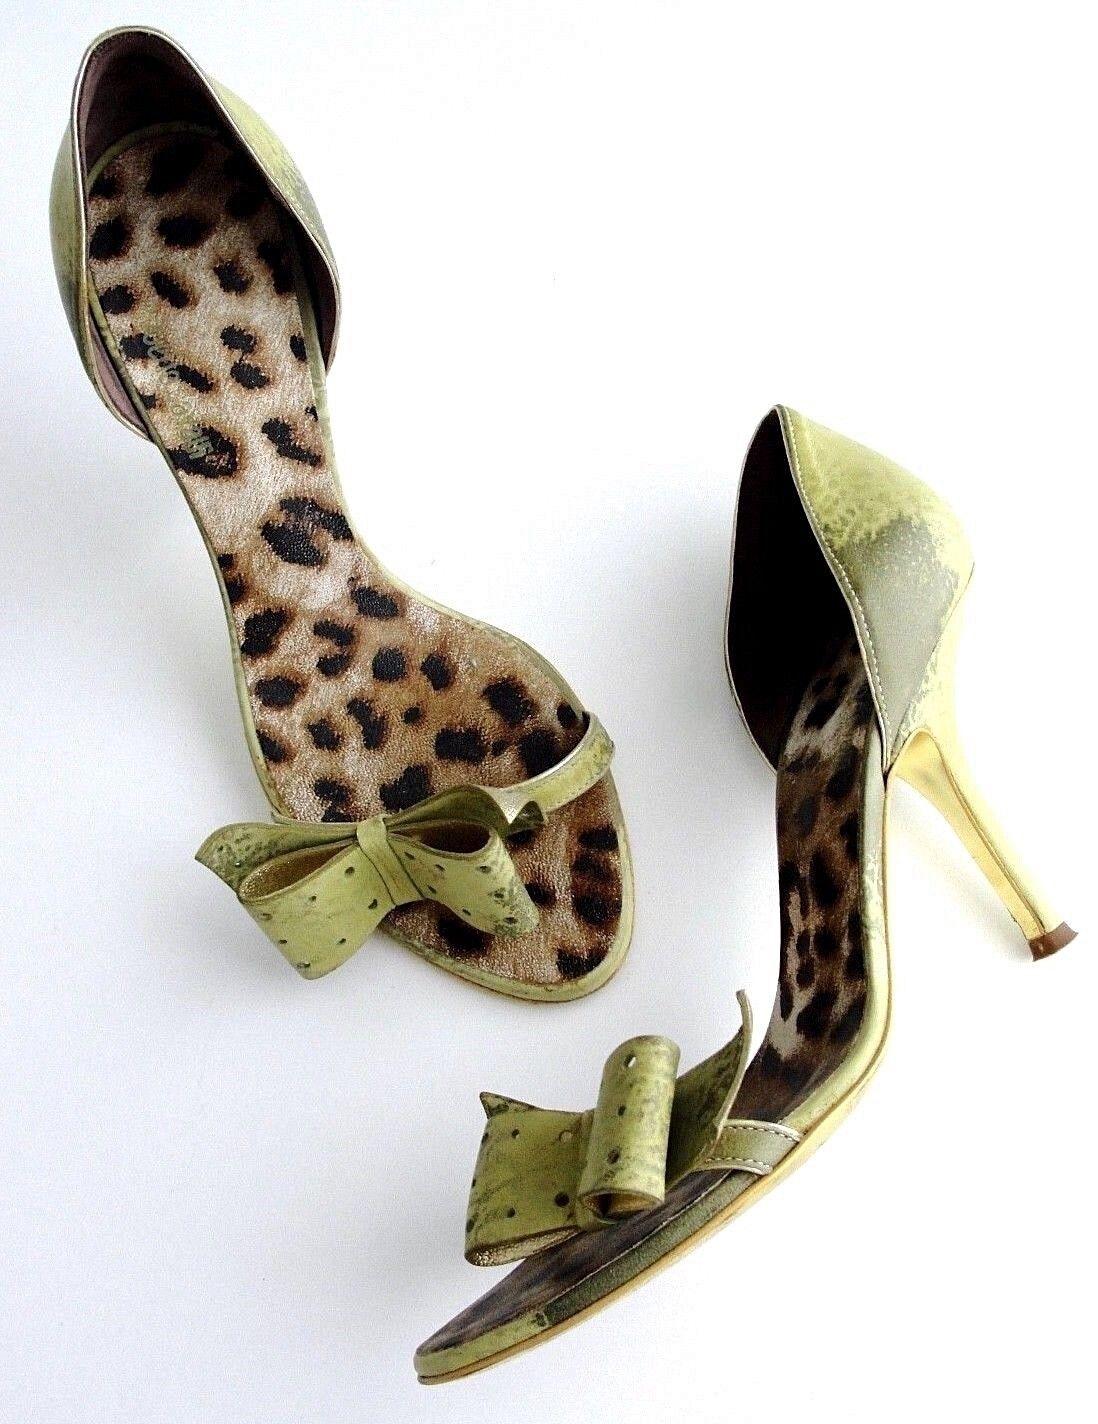 Roberto Cavalli Sandals, Heels 90mm US 7- IT 37 Immaculate condition